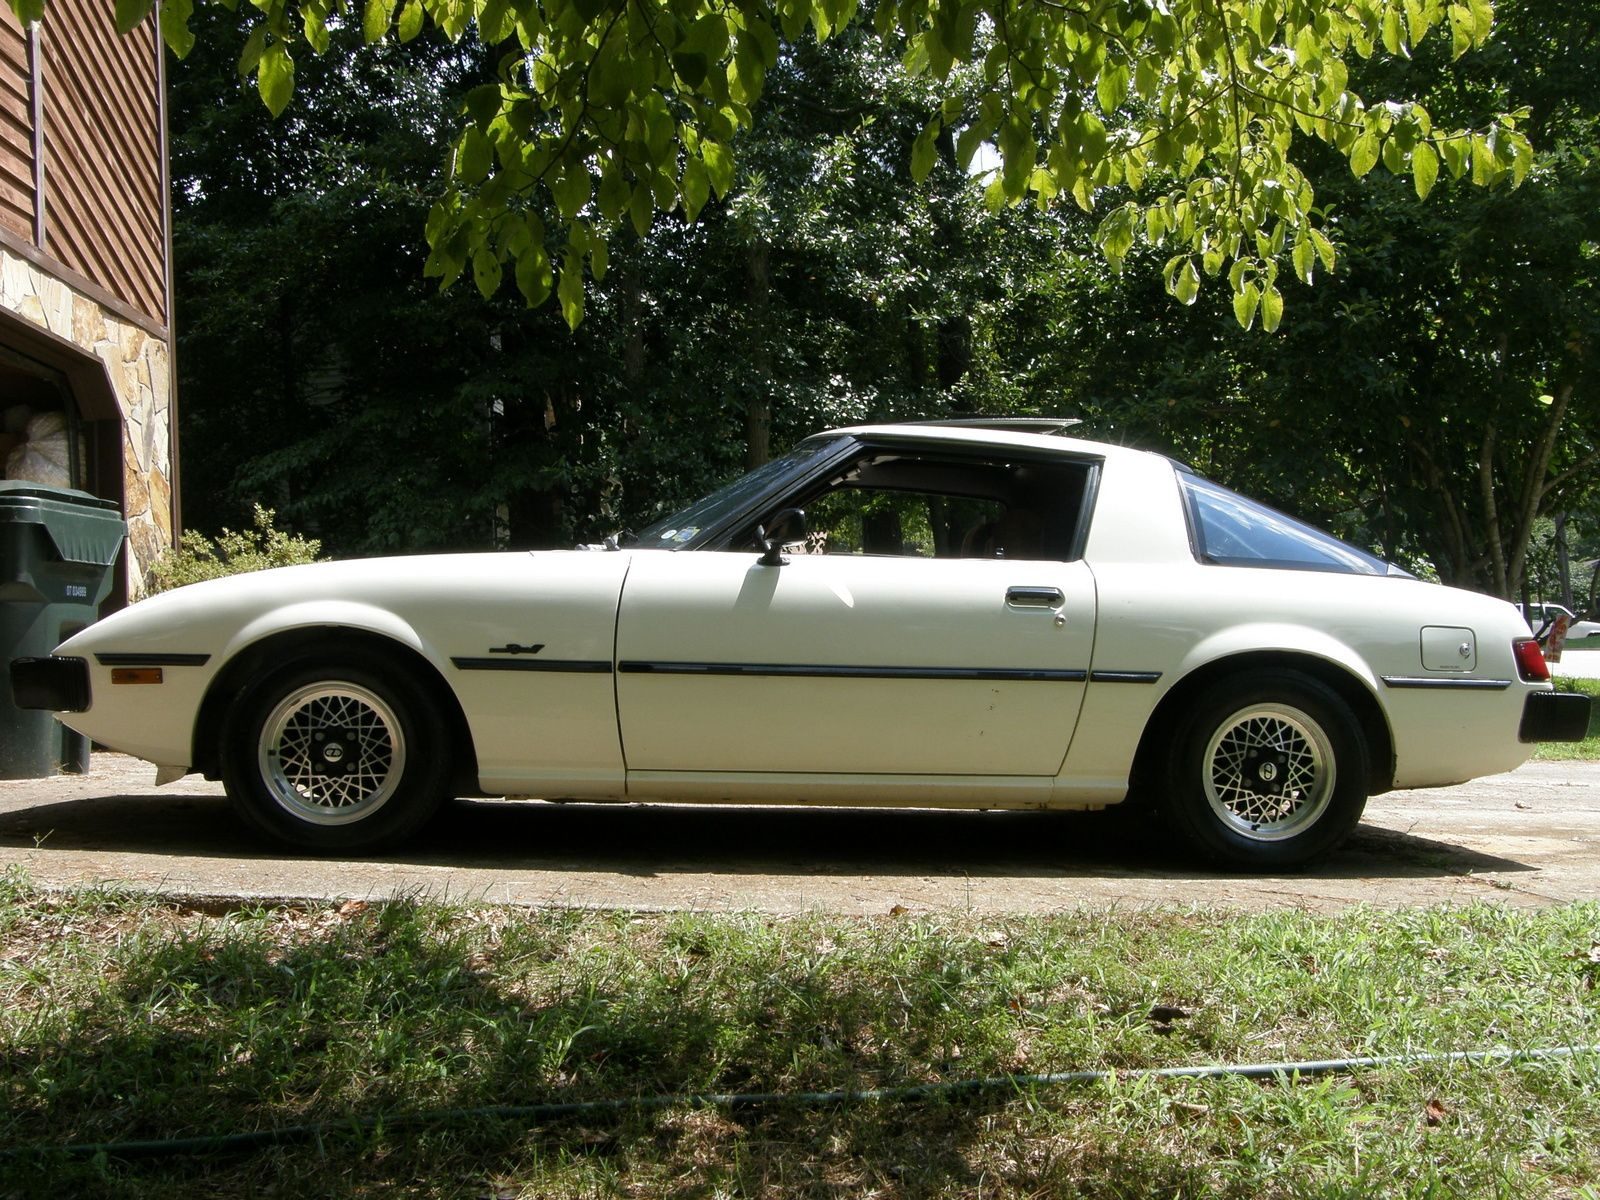 1980 Mazda RX-7 (FB) | Mazda Savanna RX-7 SA | Pinterest | Mazda ...